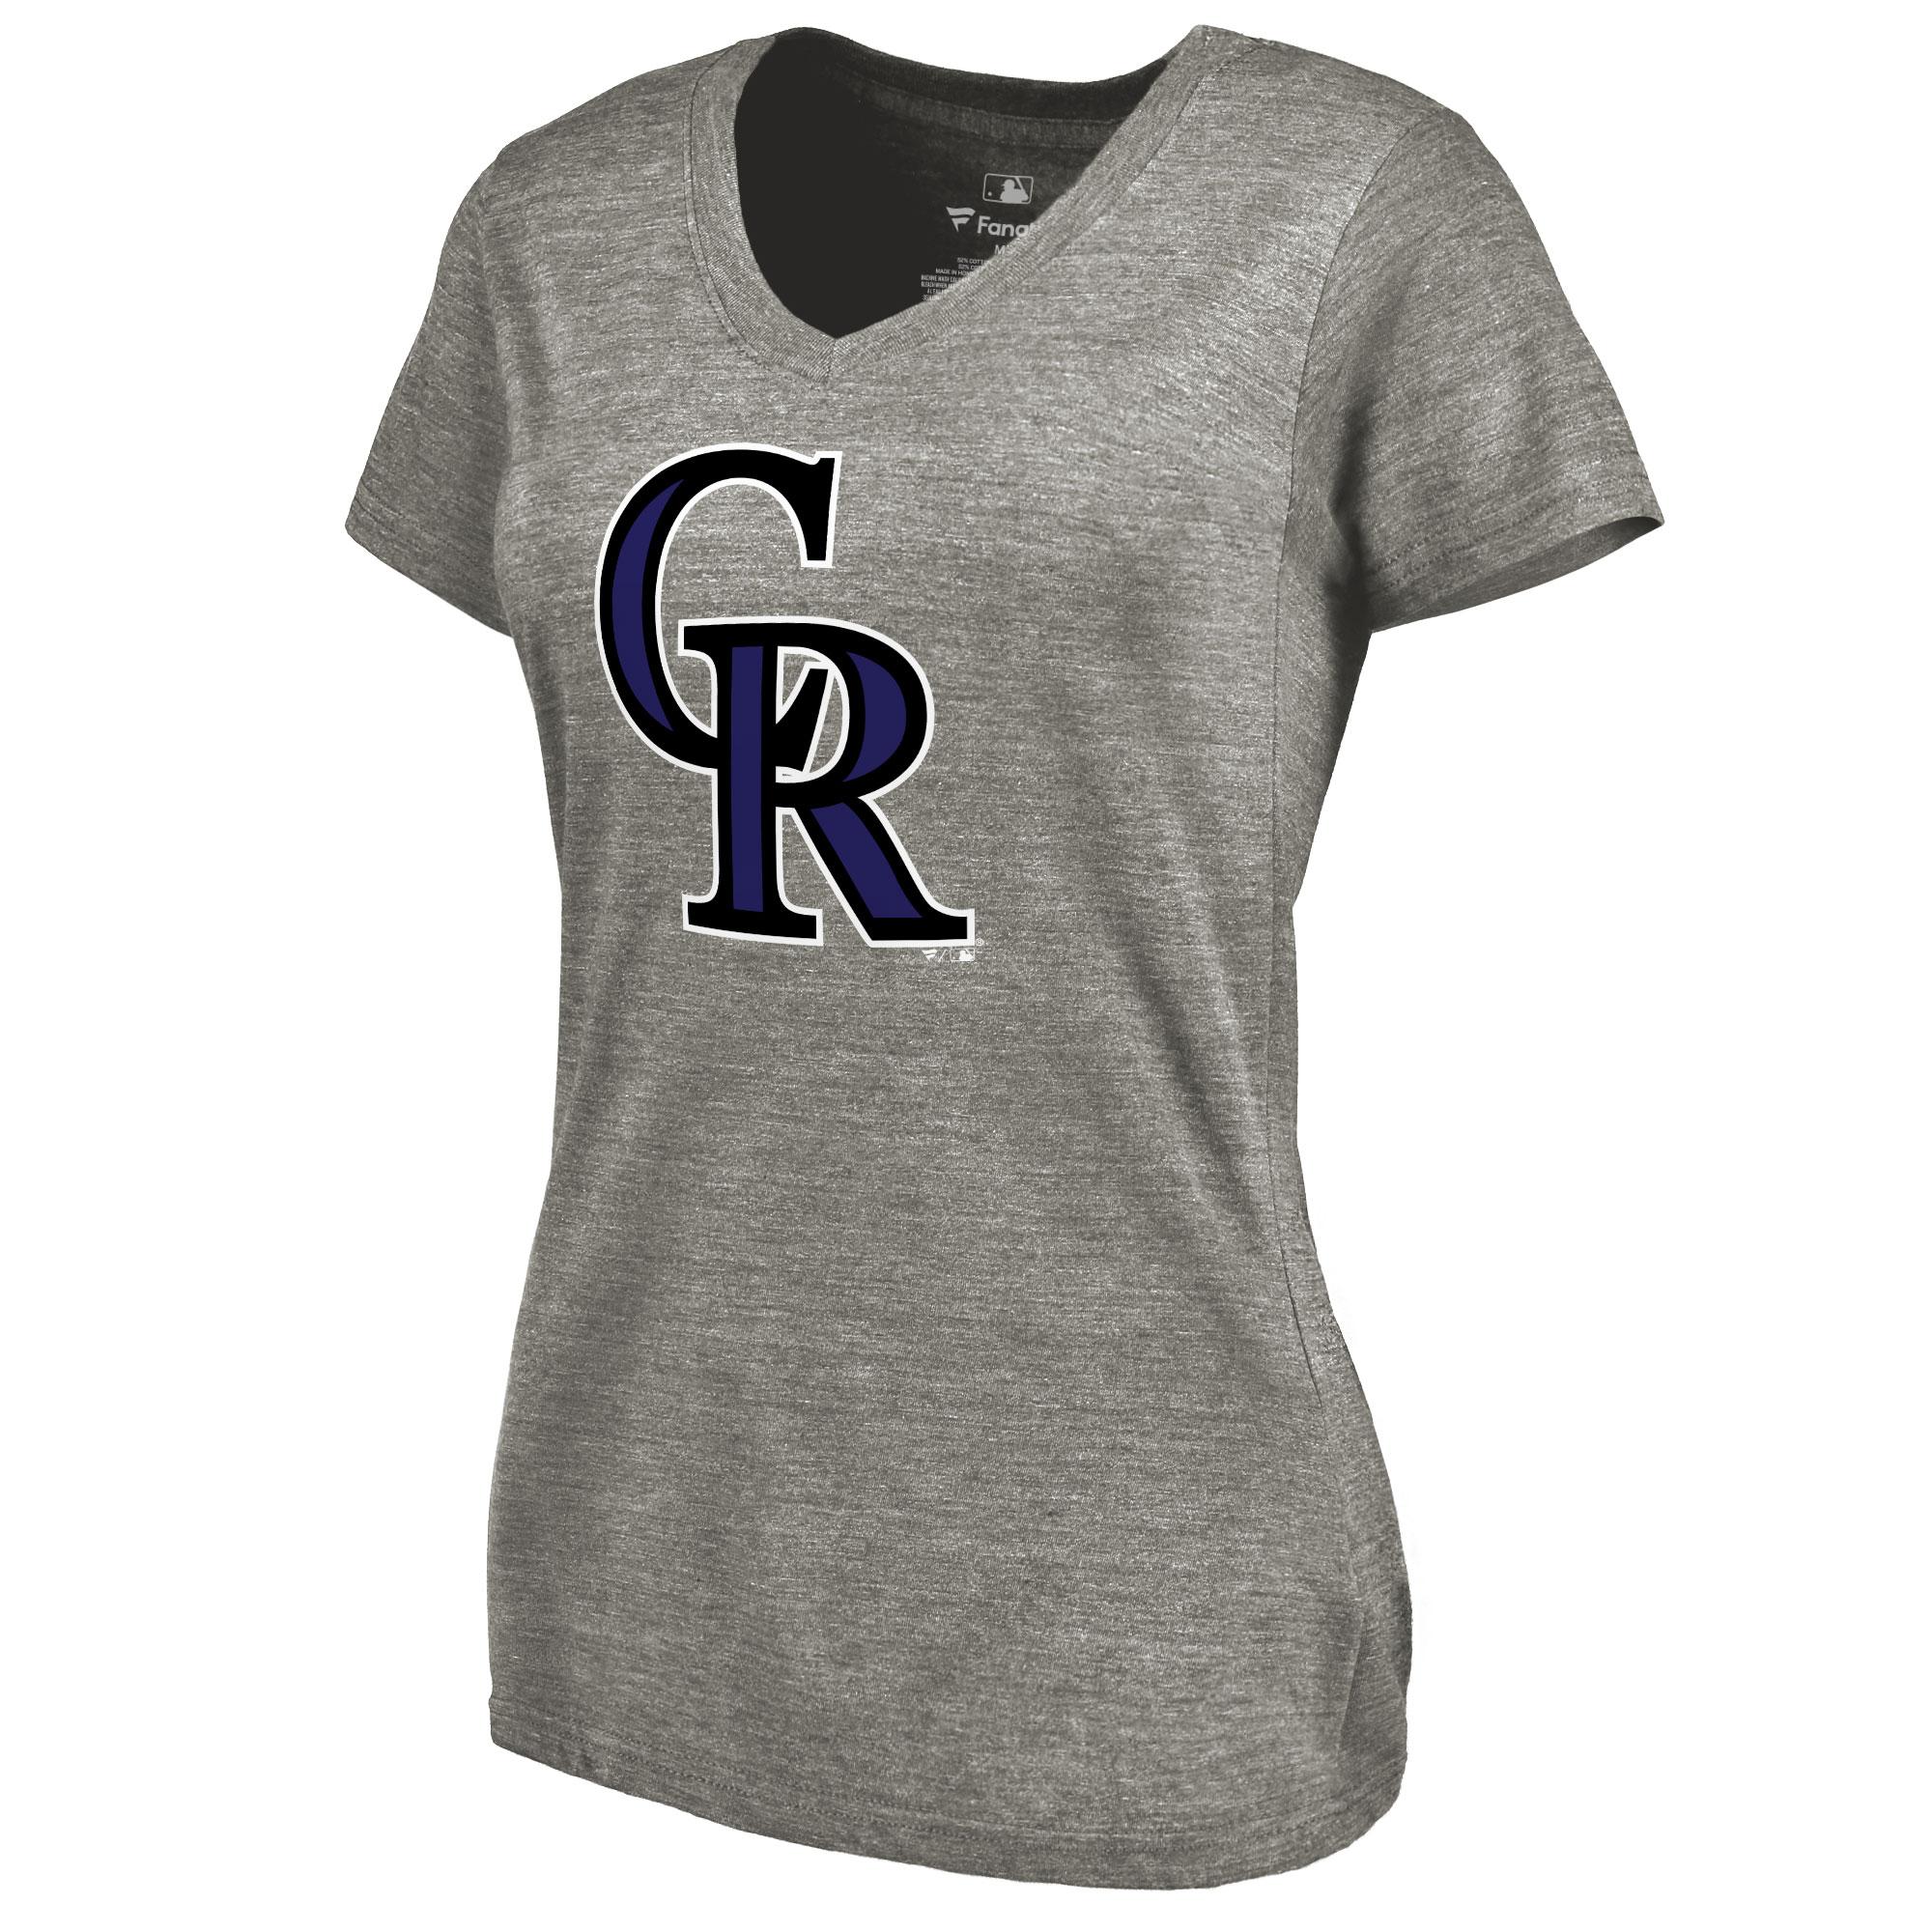 Colorado Rockies Women's Primary Logo Tri-Blend V-Neck T-Shirt - Ash